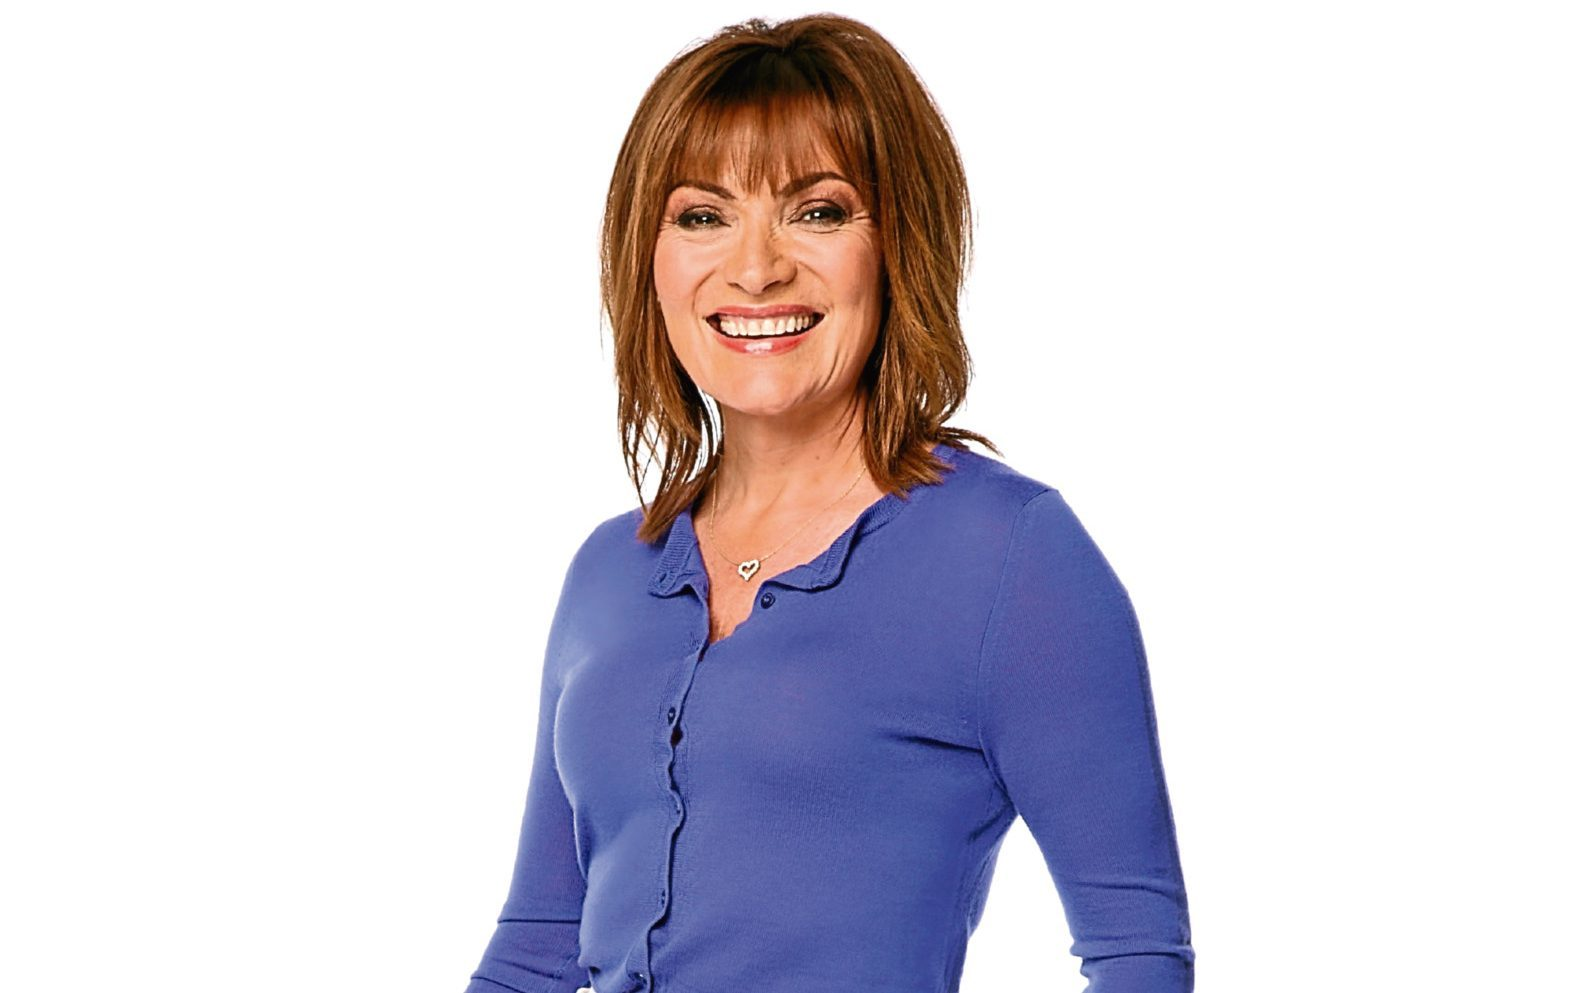 Sunday Post columinist Lorraine Kelly (ITV / Tony Ward)